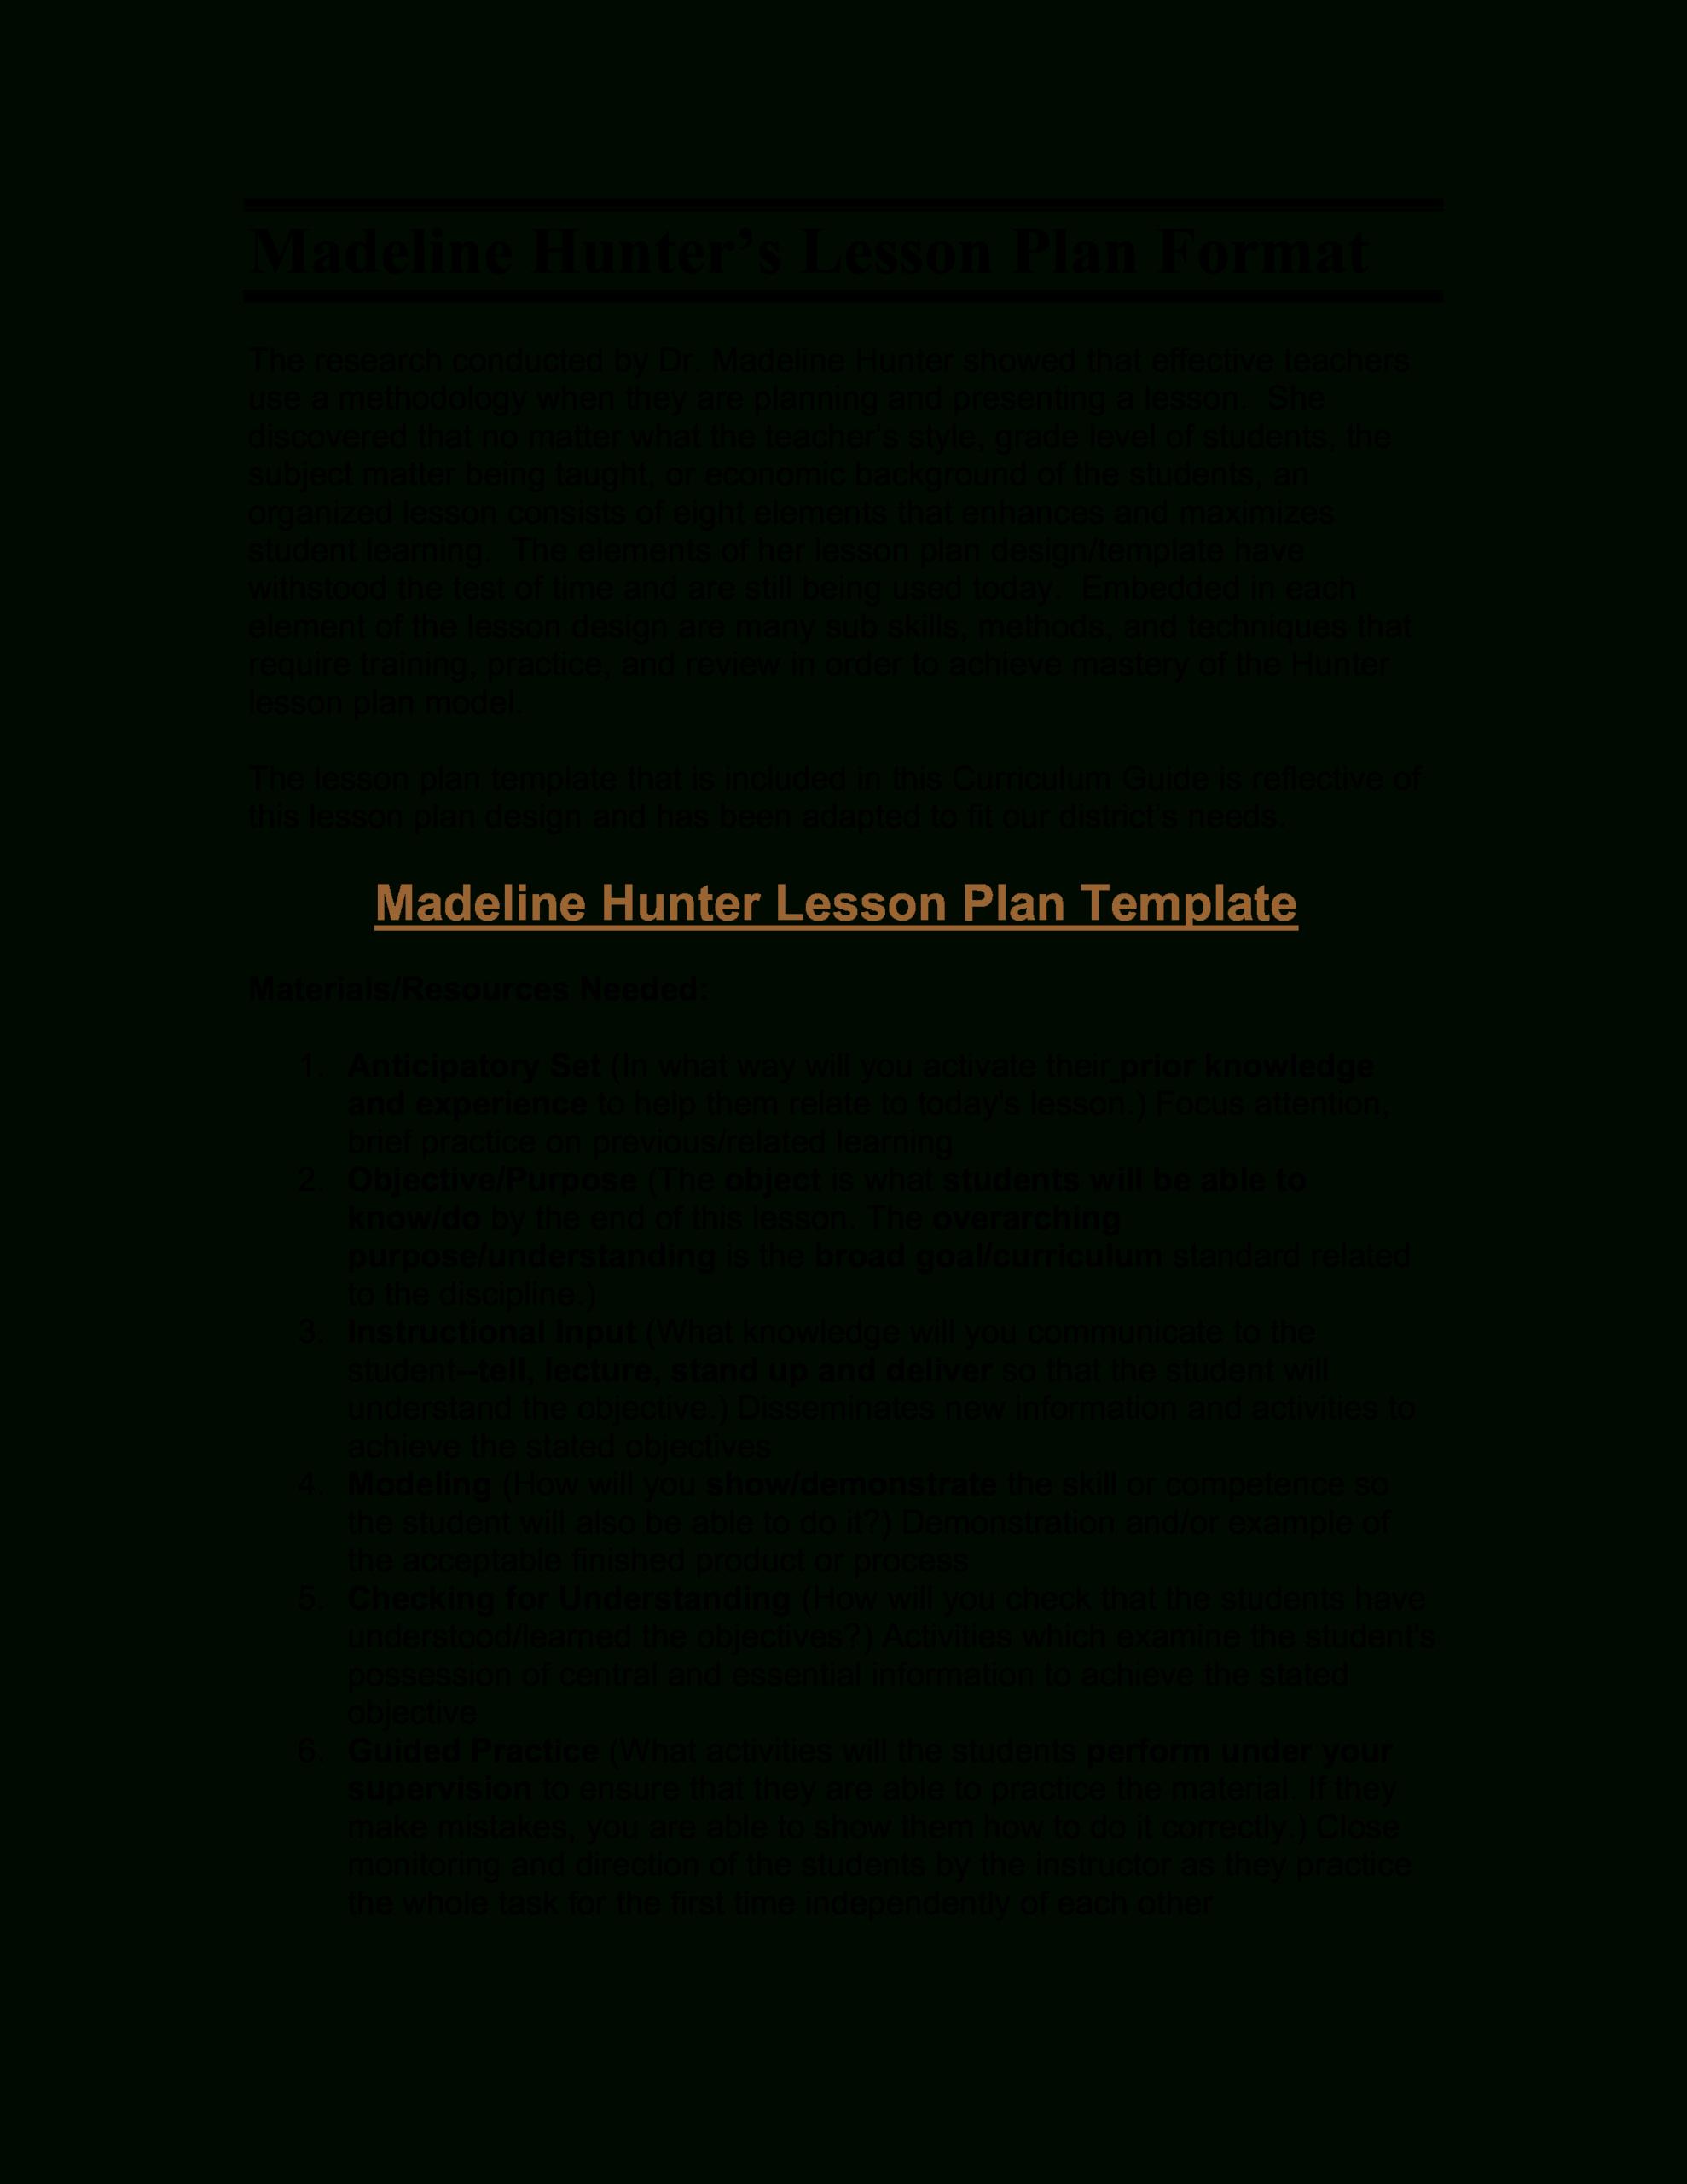 Microsoft Word - Madeline Hunter's Lesson Plan Format within Madeline Hunter Lesson Plan Blank Template